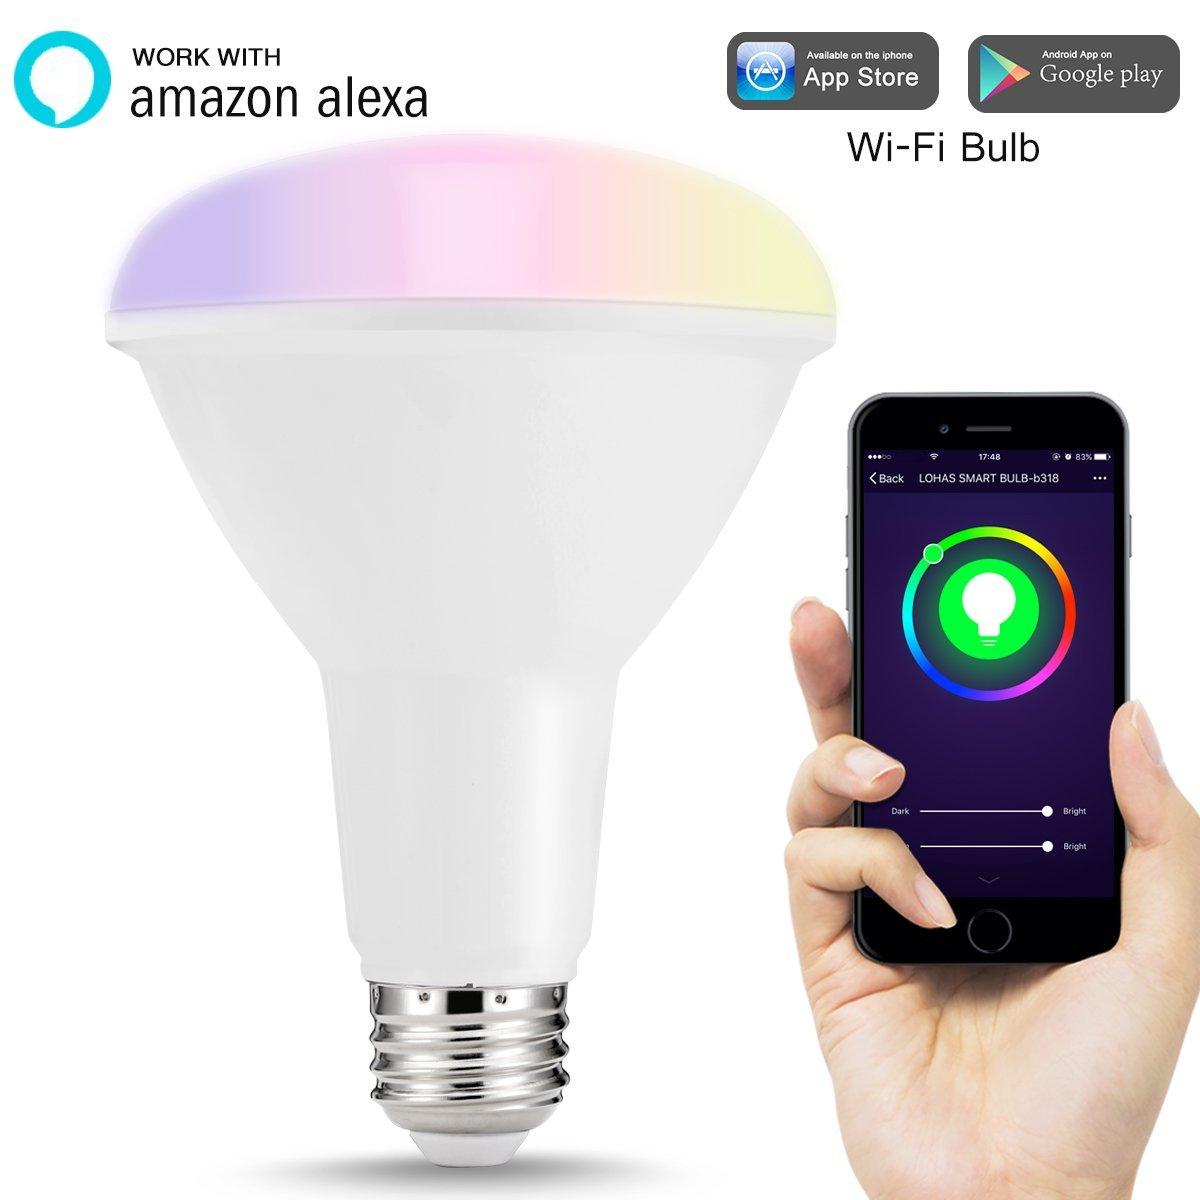 LOHAS BR30 Smart LED Alexa Color Light Bulb for $17.99 @ Amazon